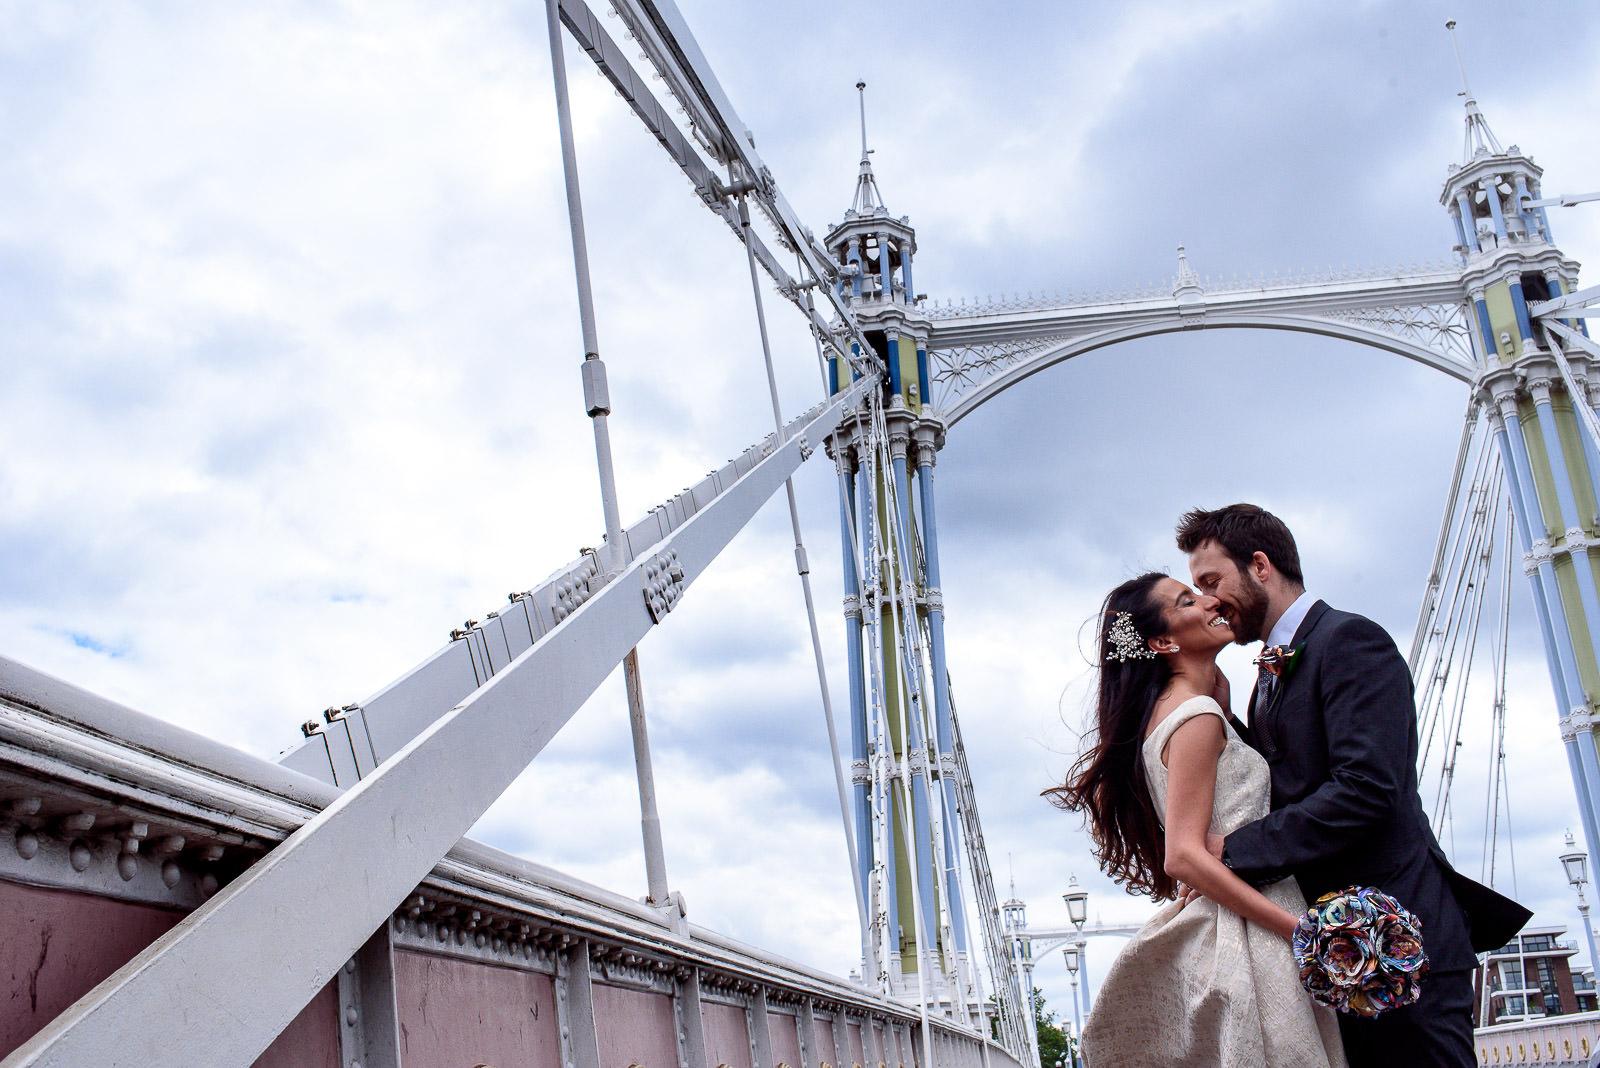 Couple taking wedding photos on Albert Bridge in London